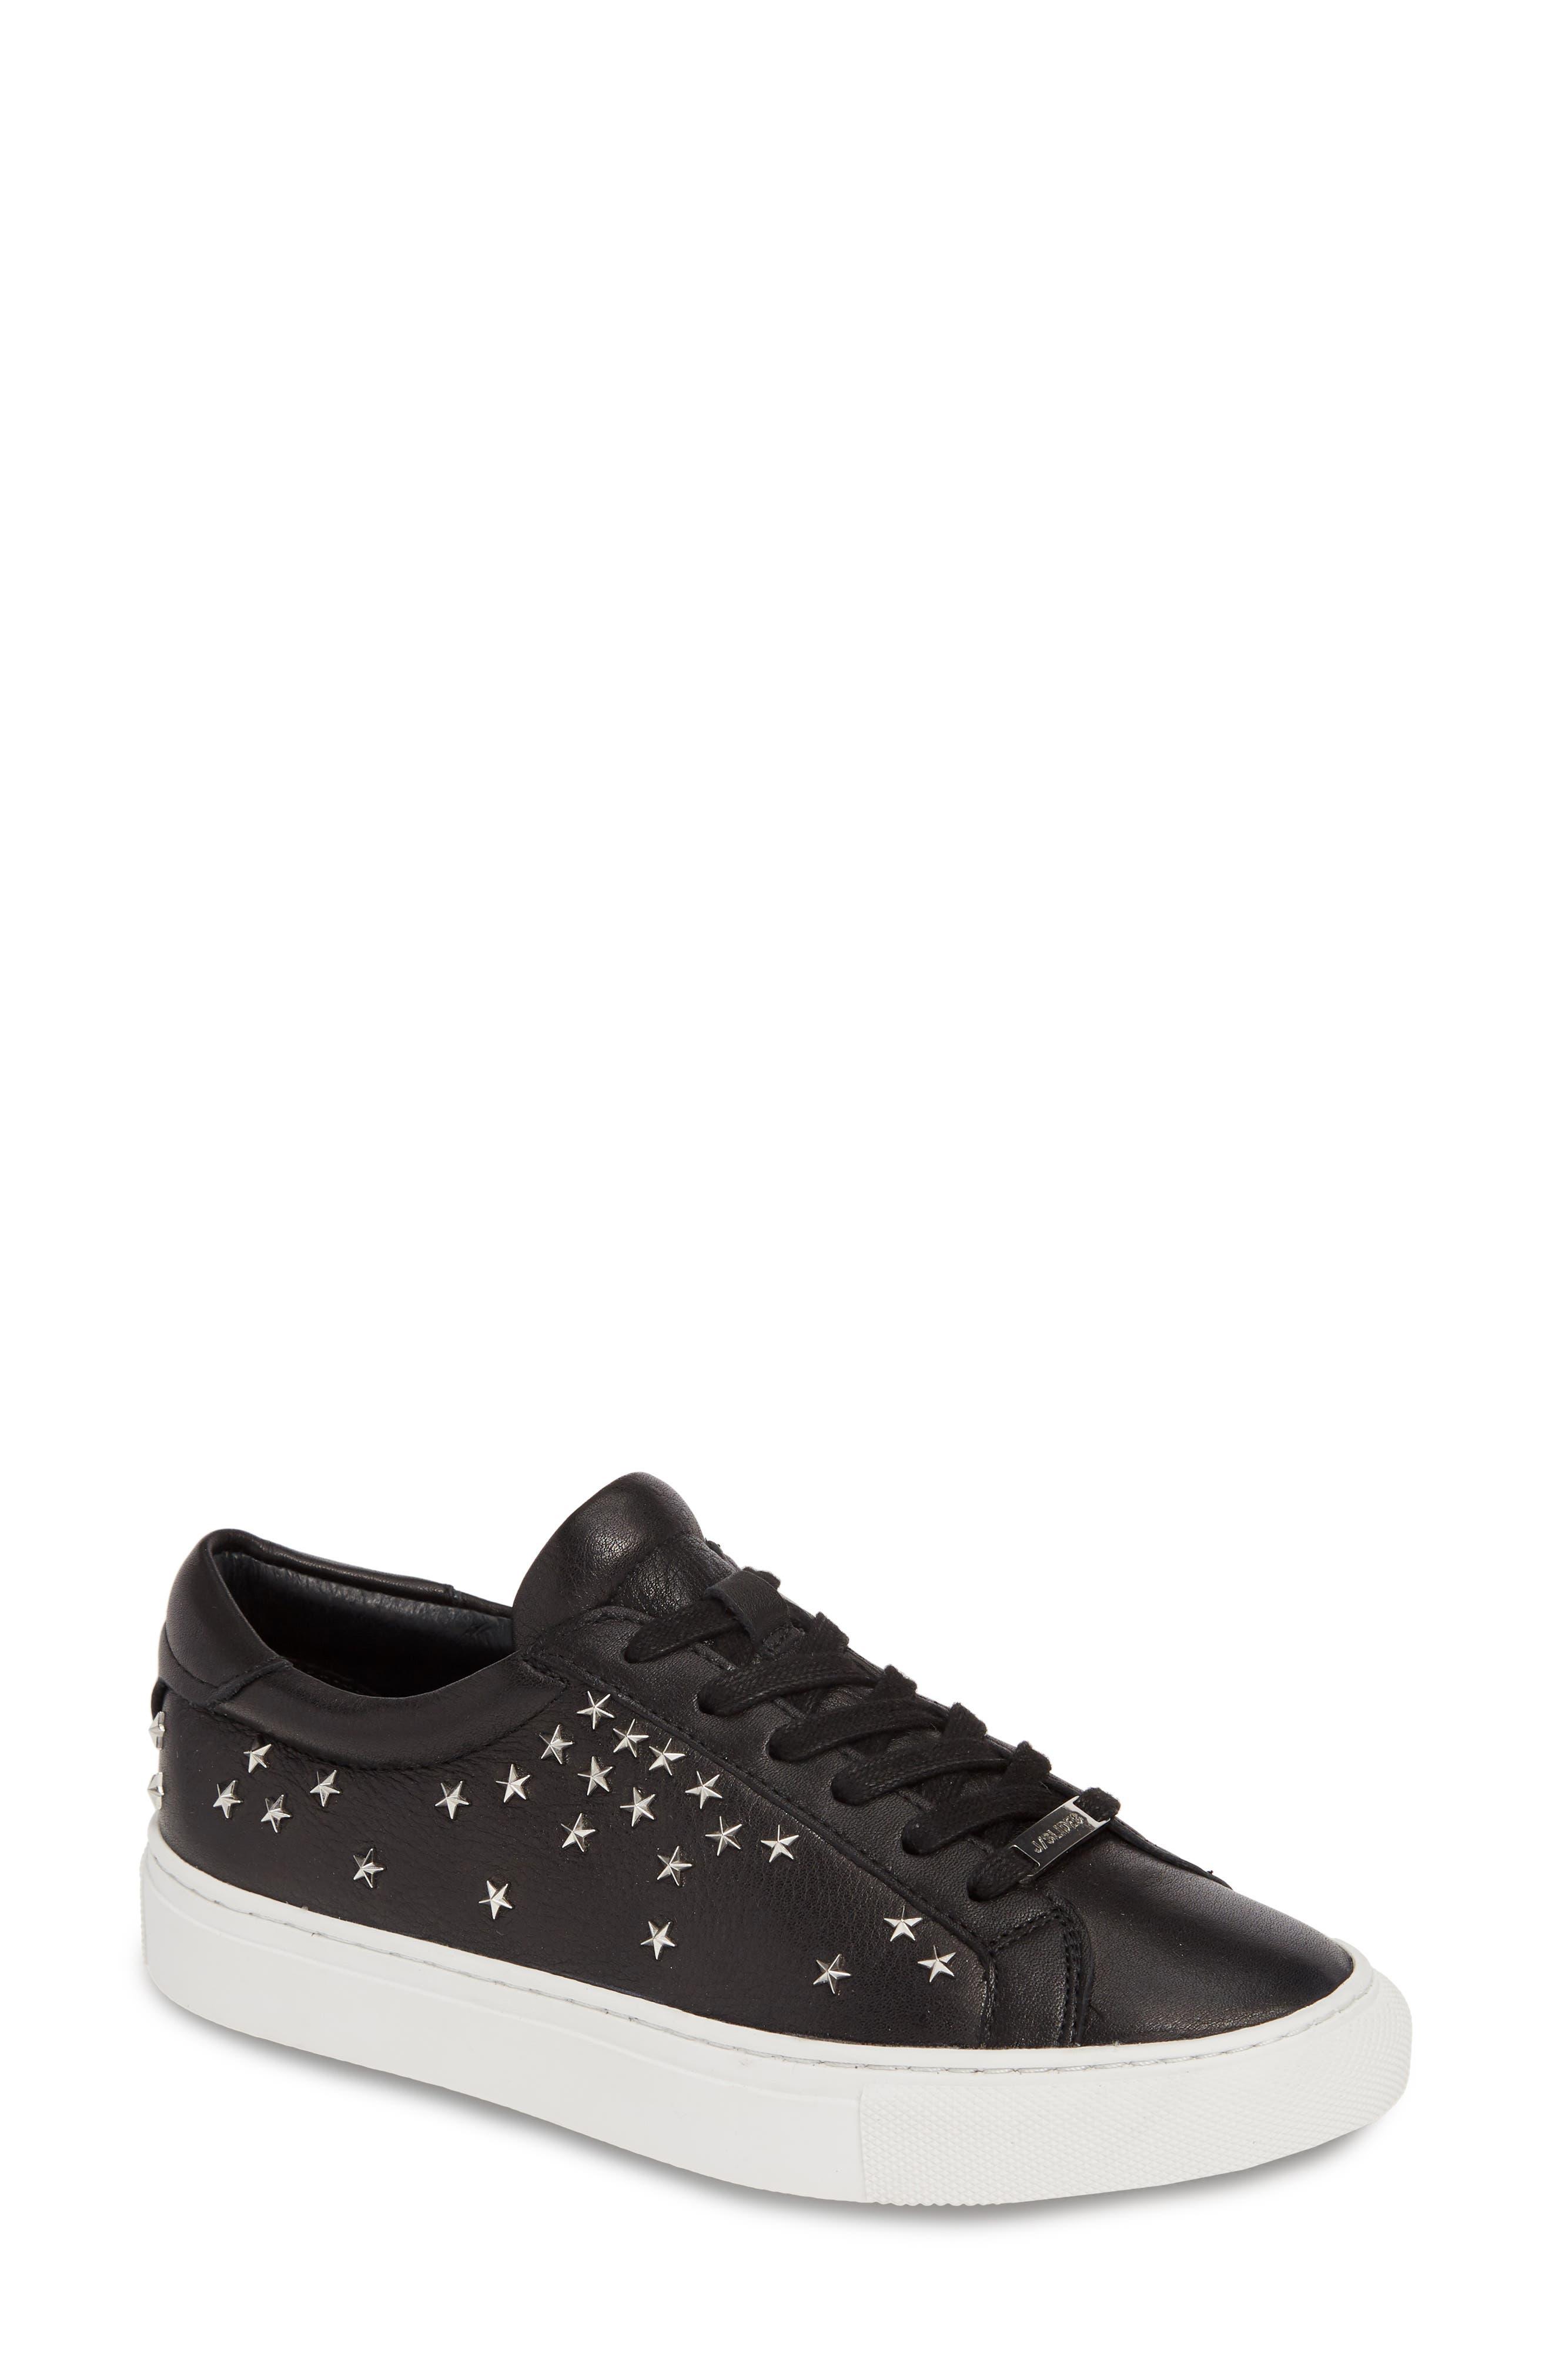 Jslides Liberty Sneaker, Black